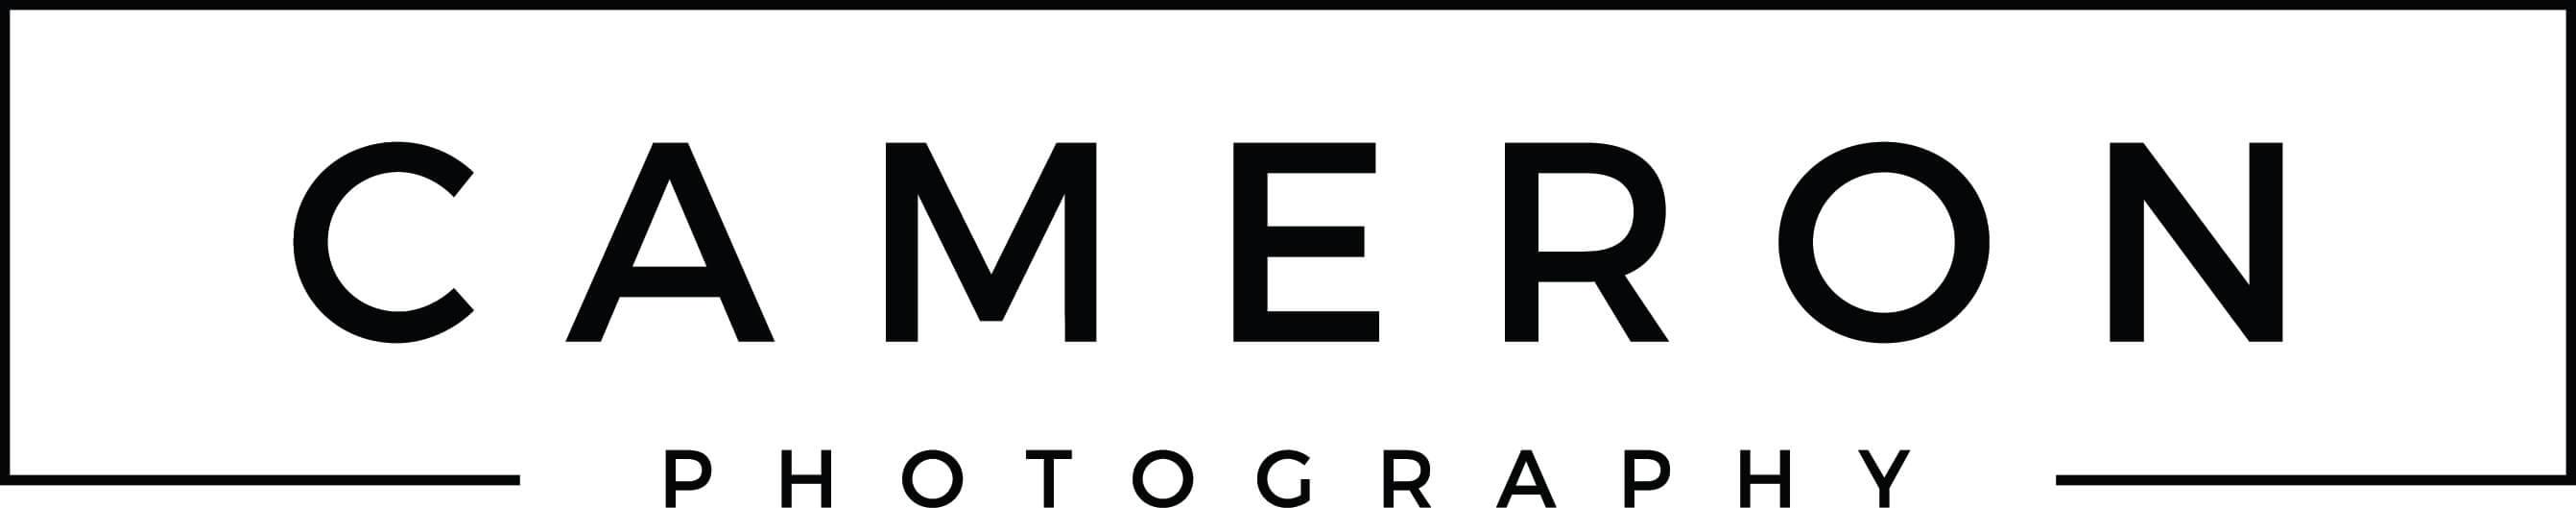 Cameron Photography